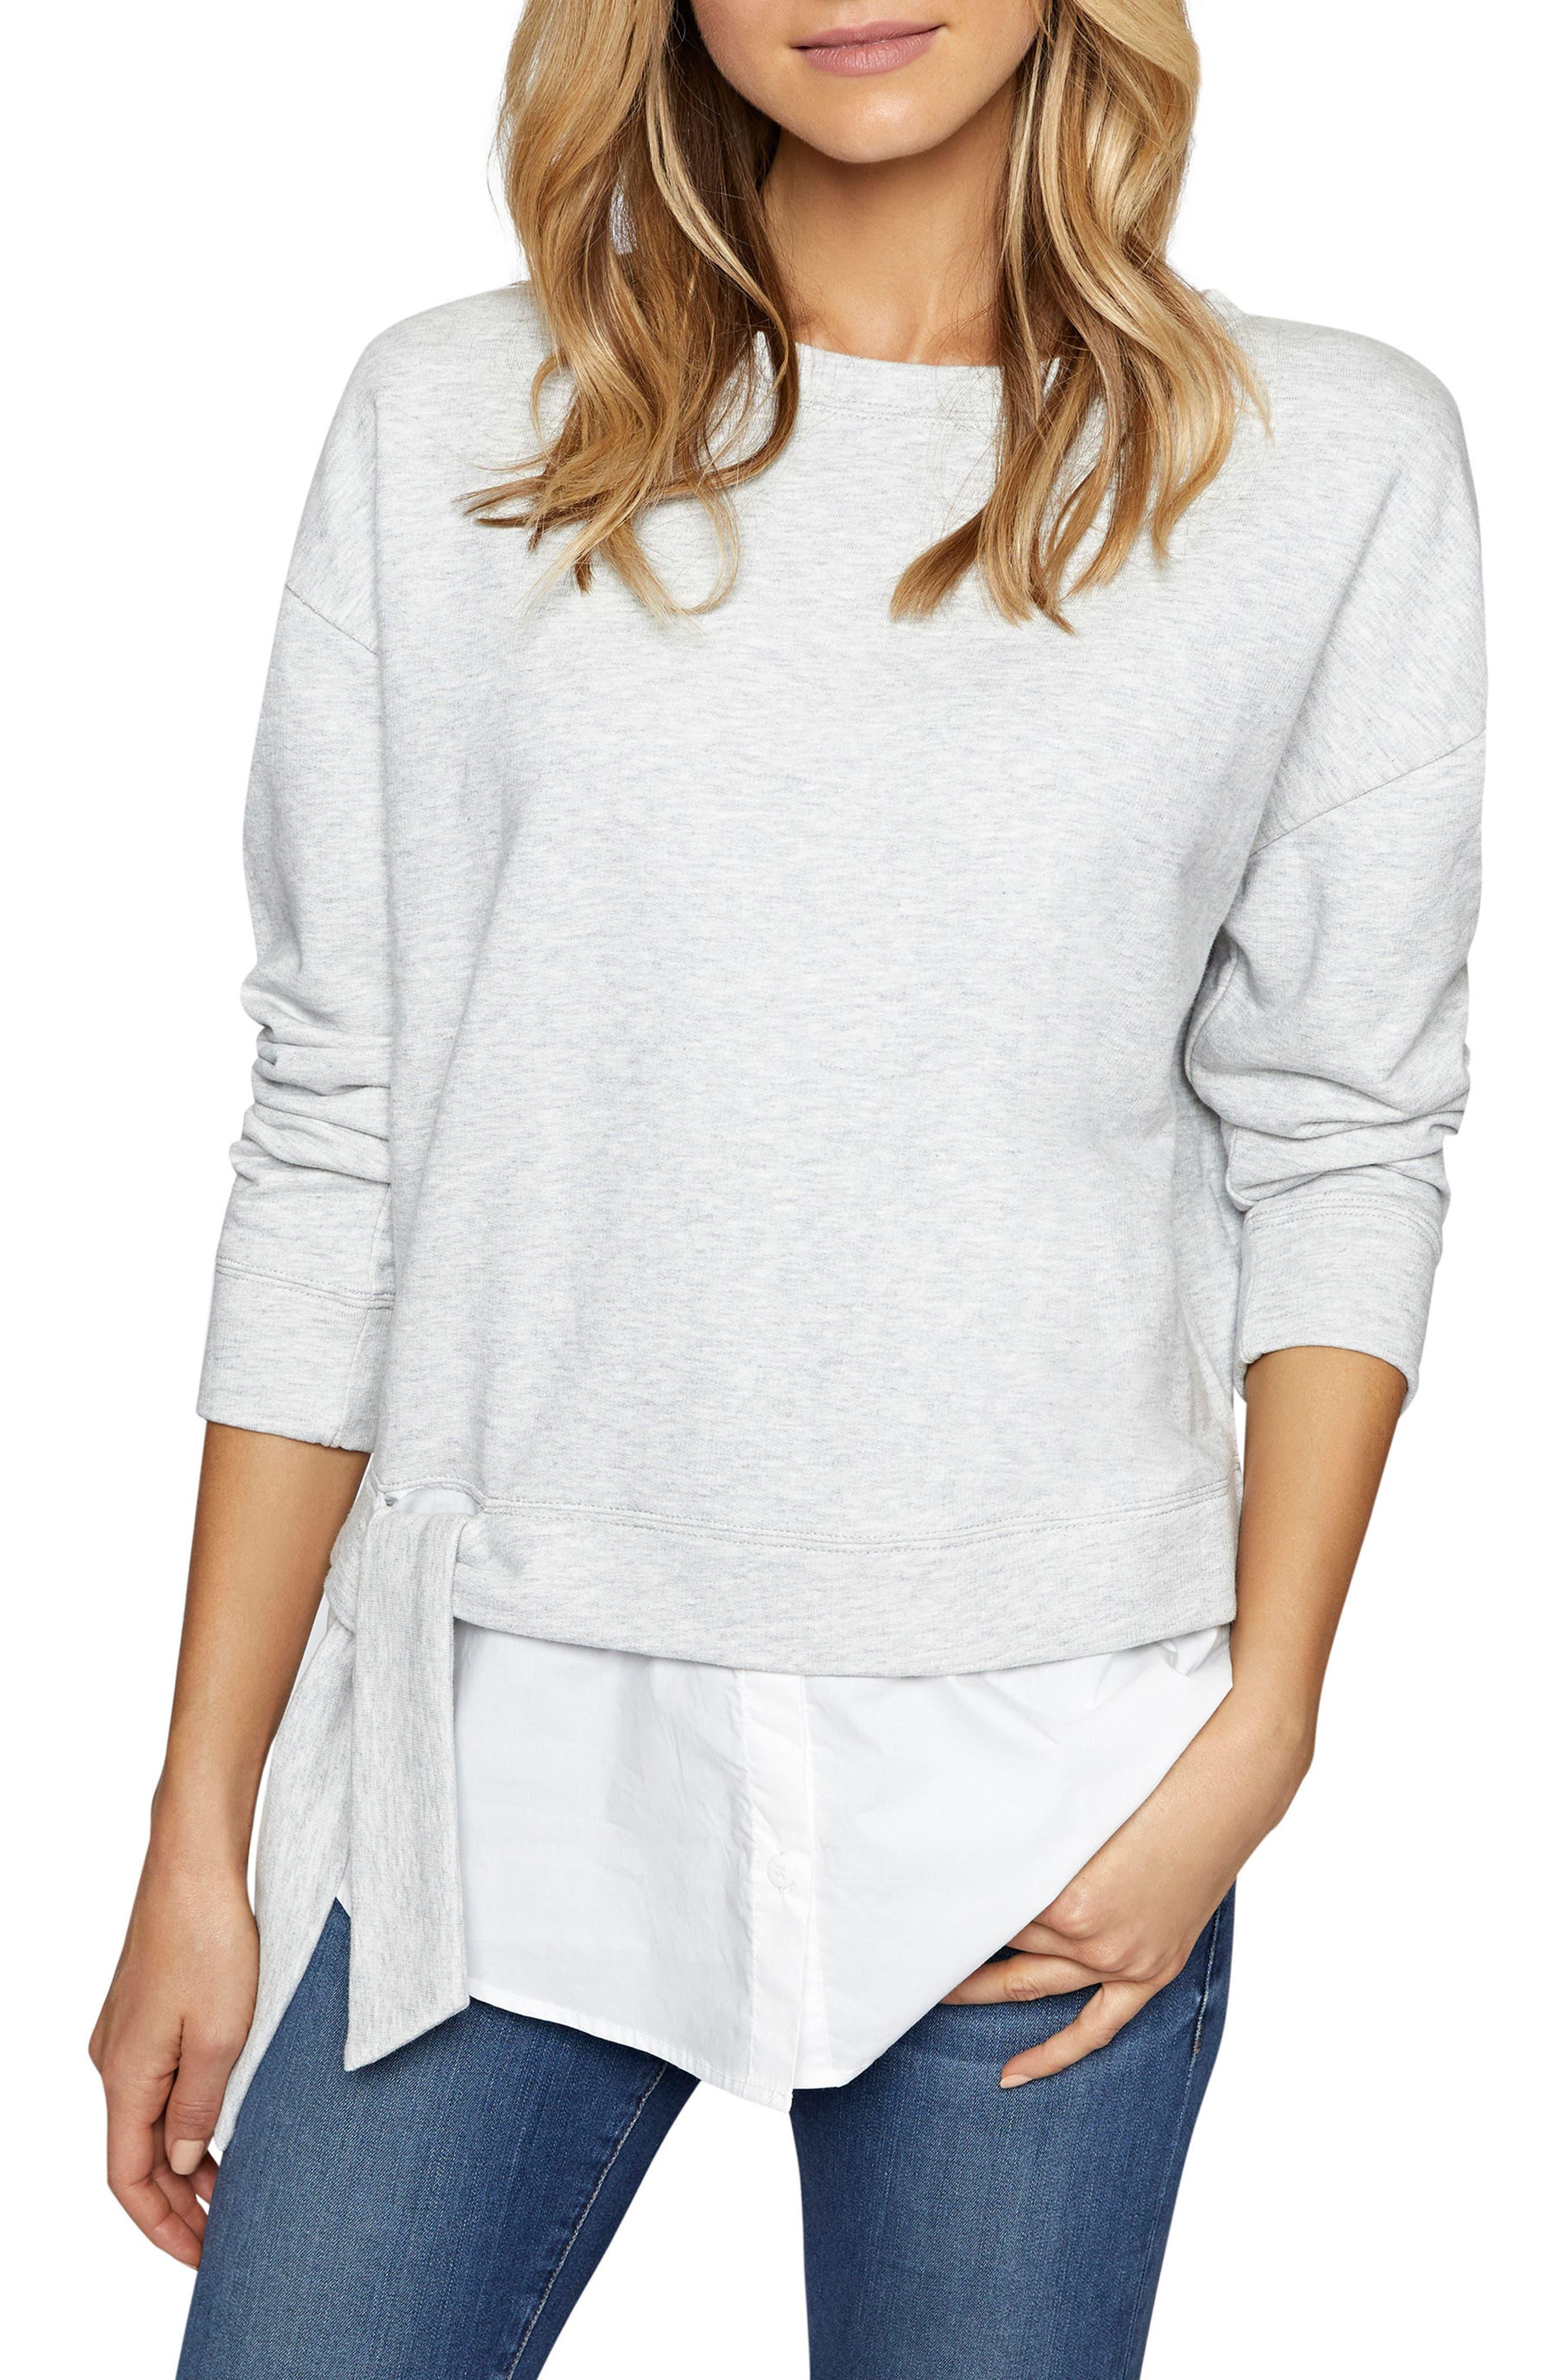 Ally Layered Look Sweatshirt,                         Main,                         color, Heather Grey